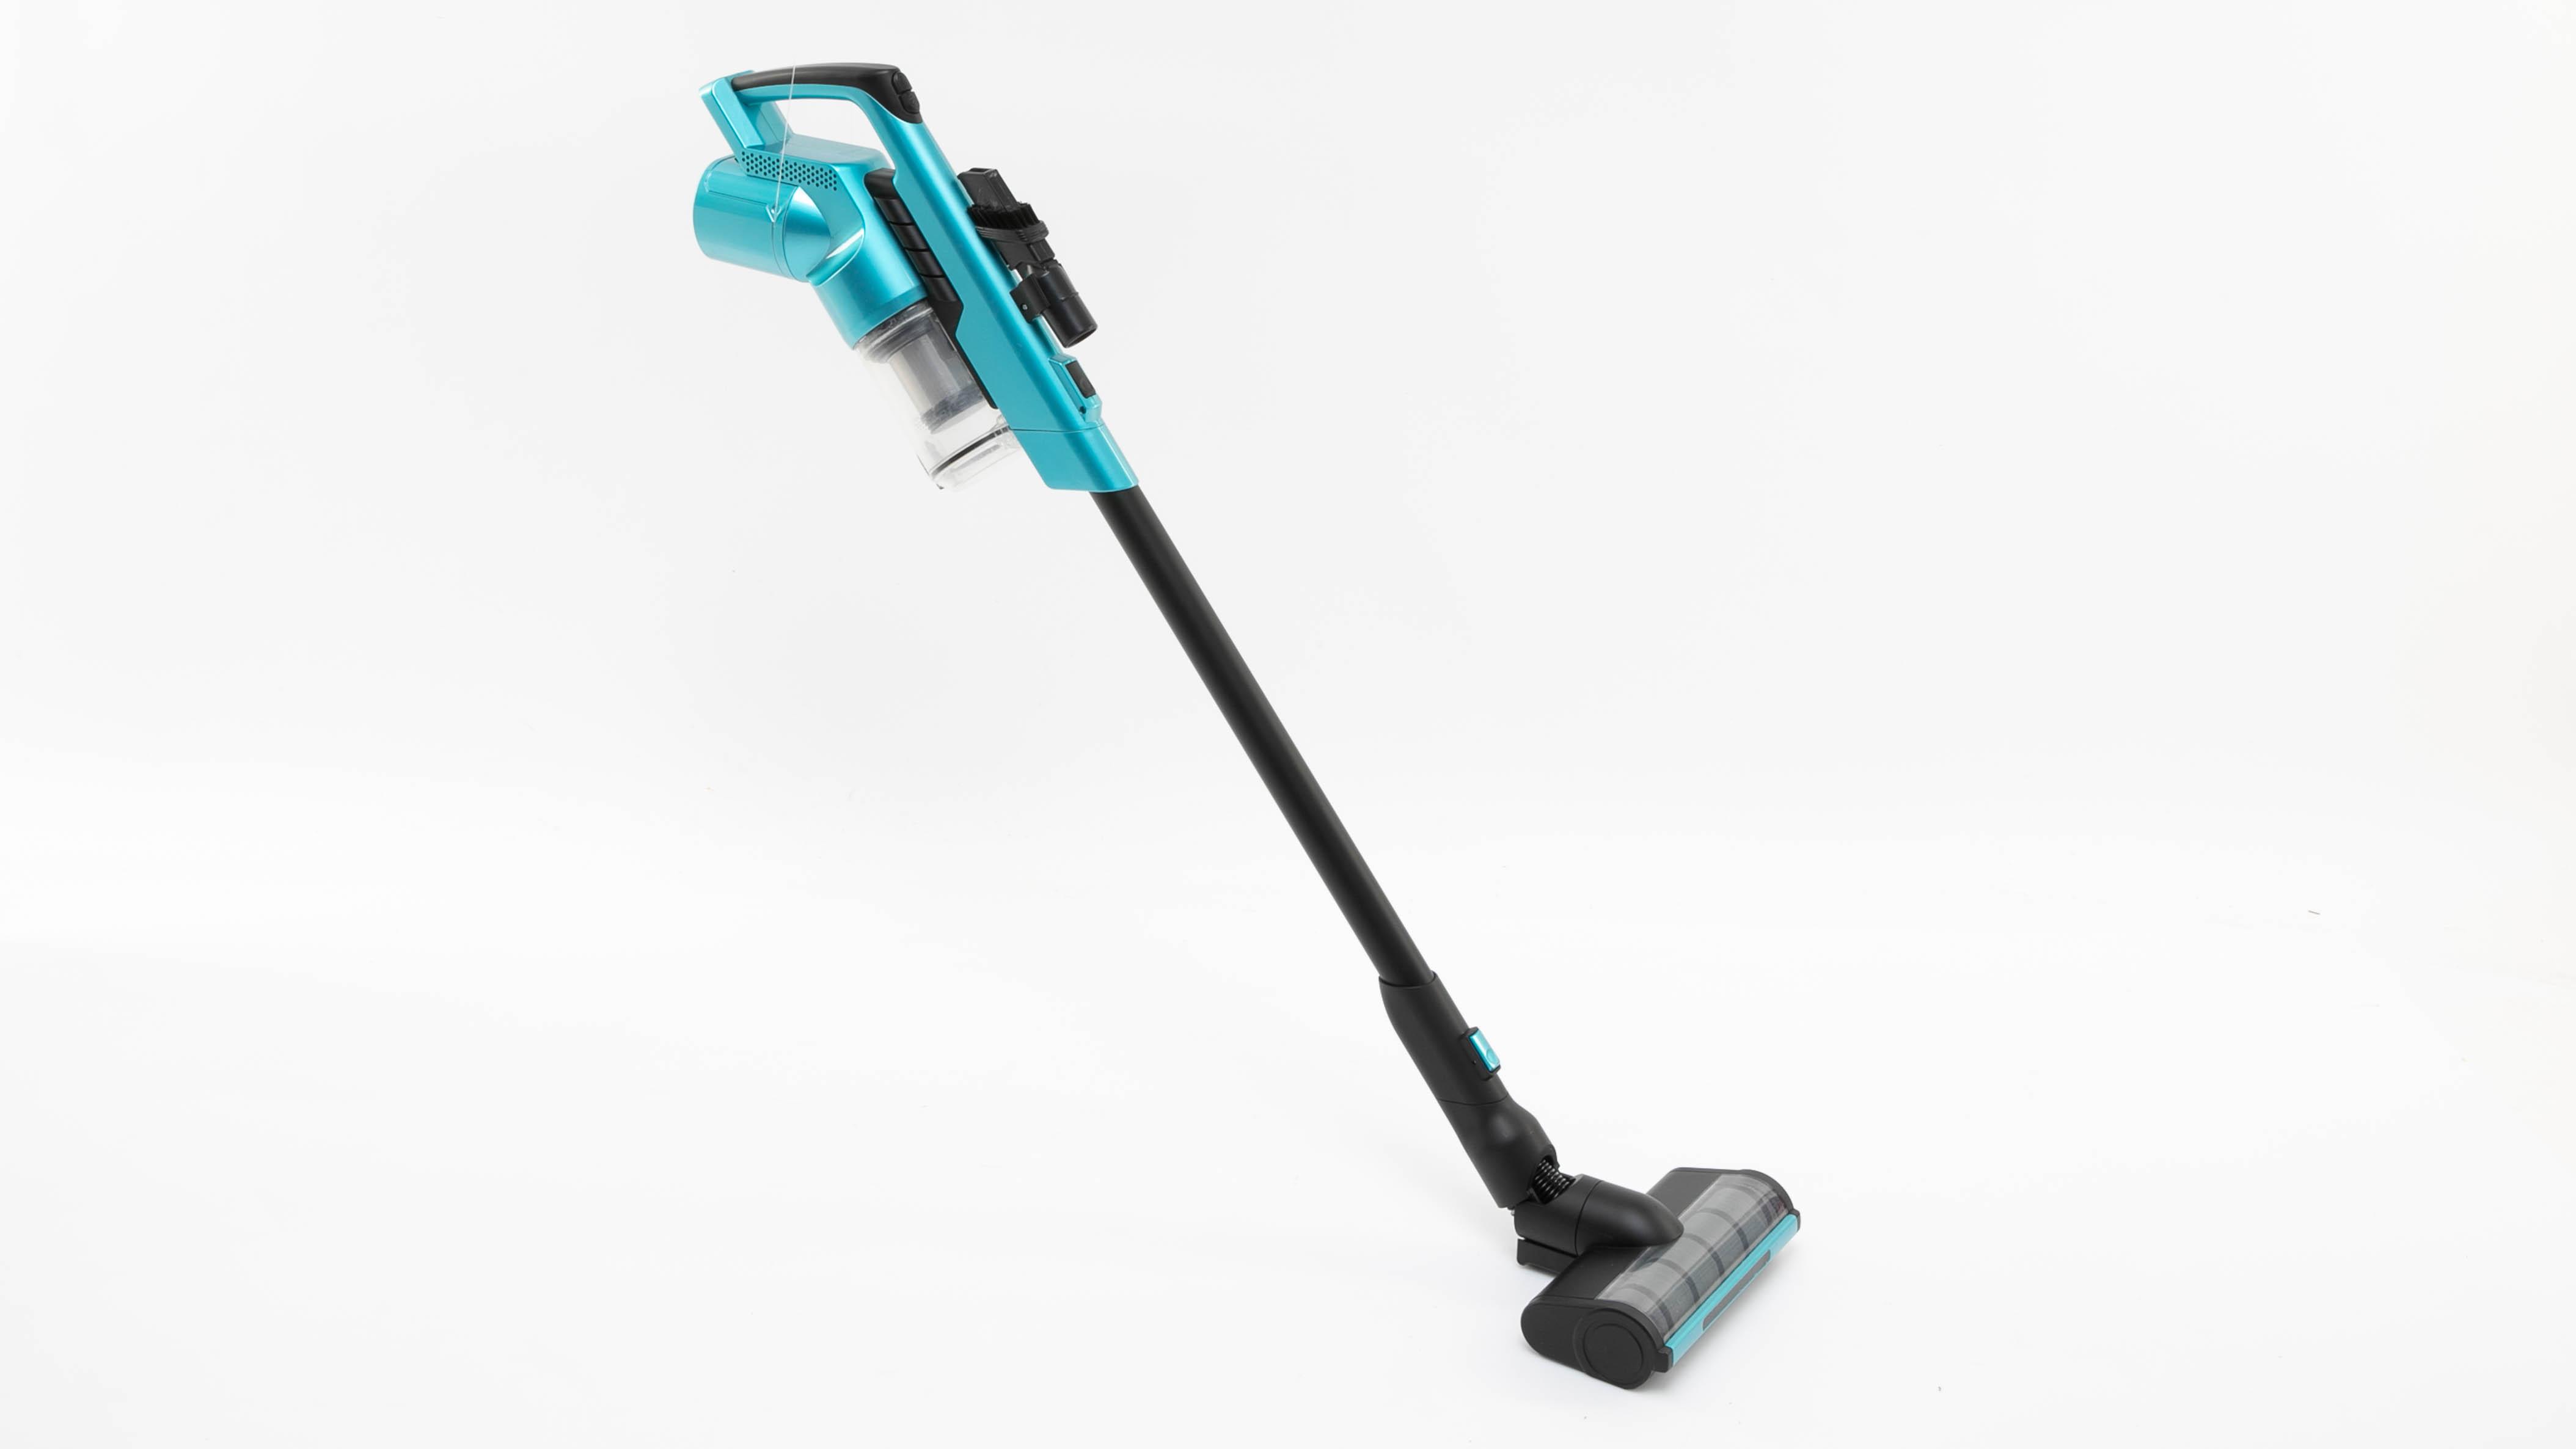 Kmart Anko Cordless Stick Vacuum 42742678 carousel image